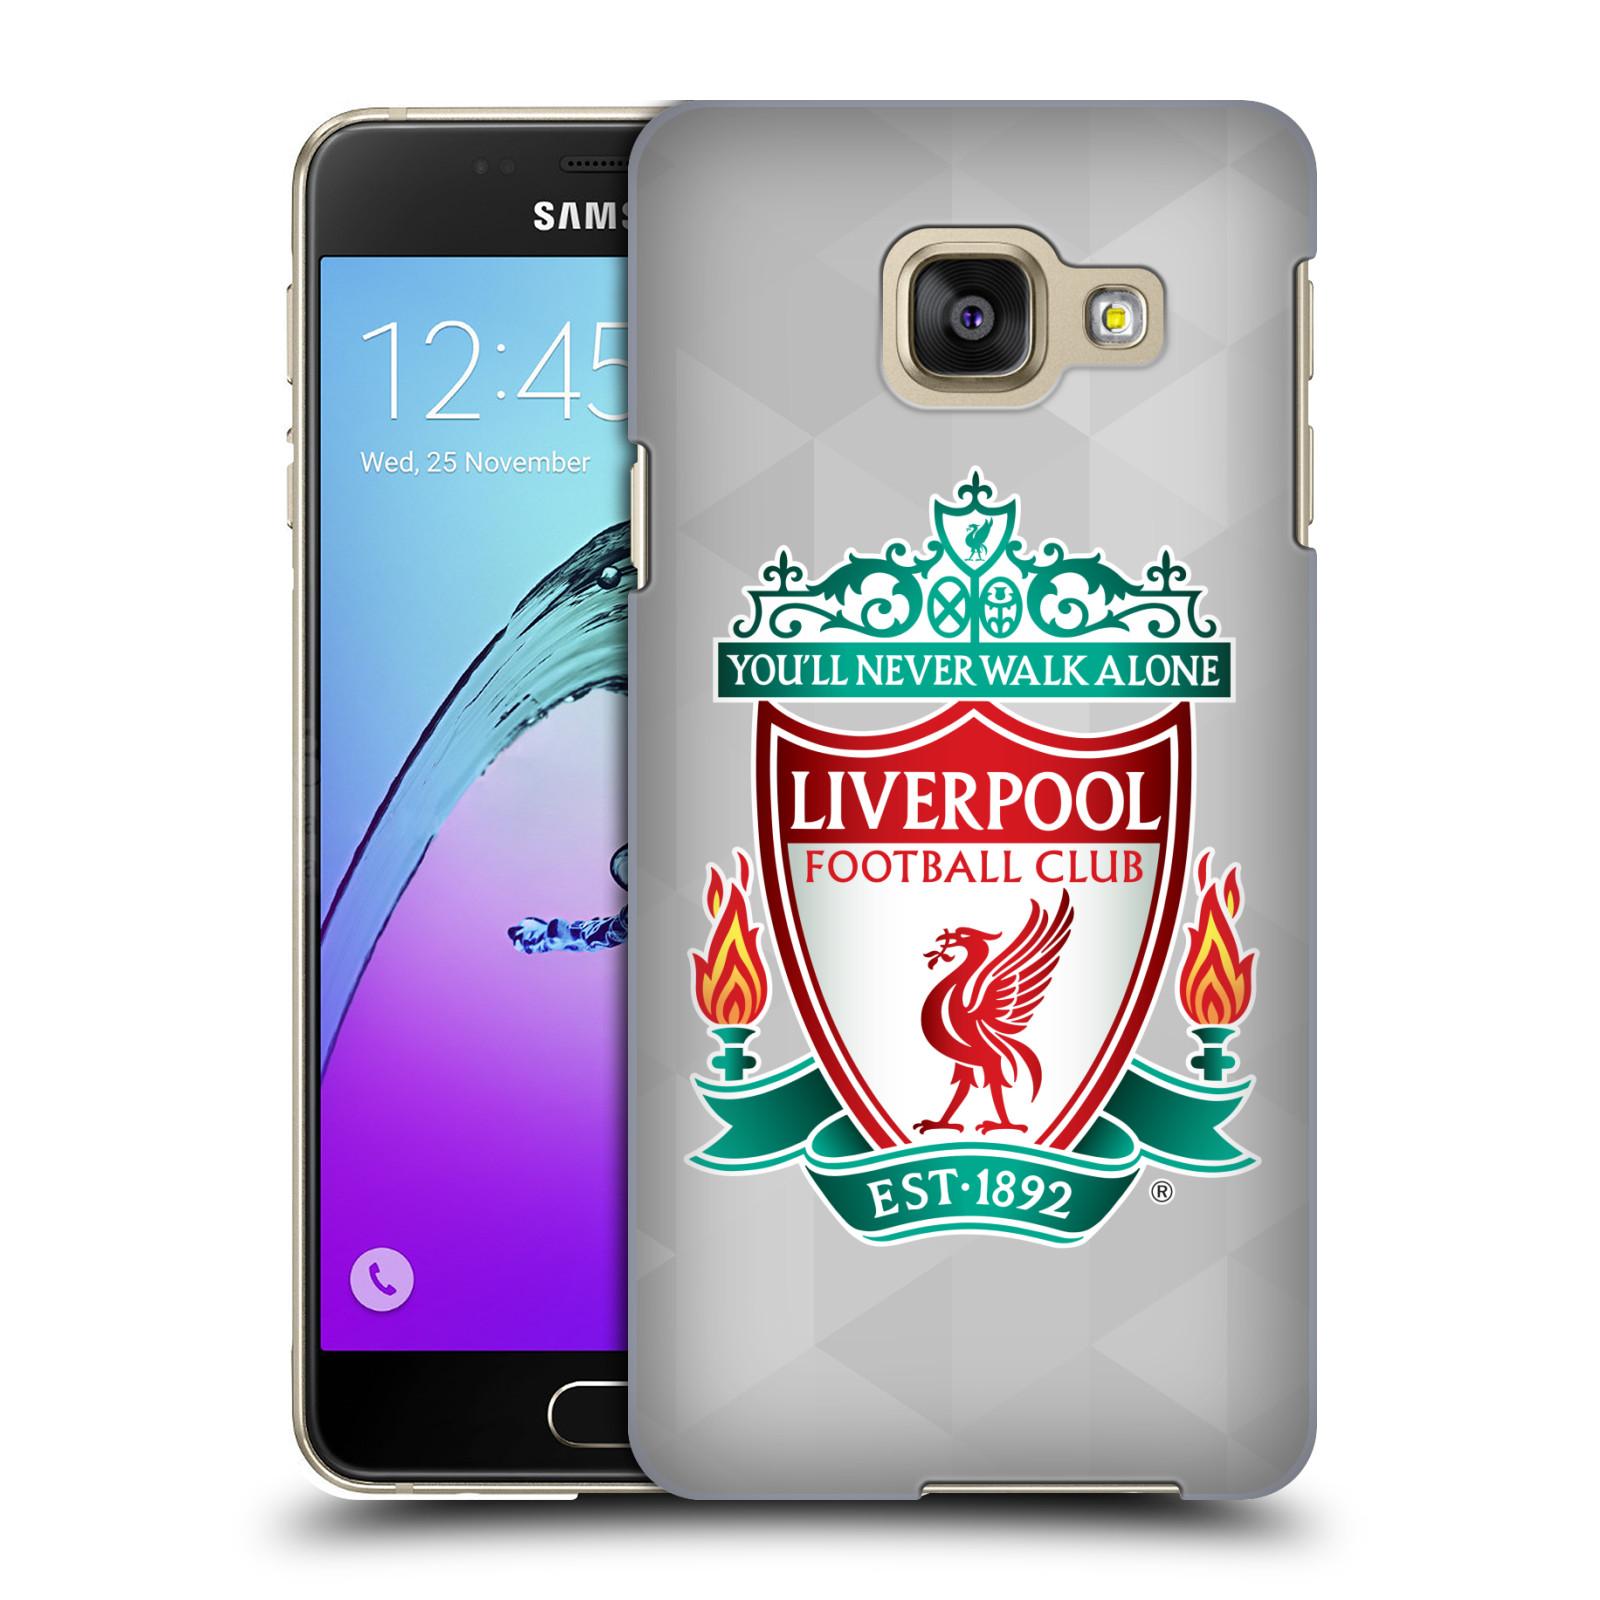 Plastové pouzdro na mobil Samsung Galaxy A3 (2016) HEAD CASE ZNAK LIVERPOOL FC OFFICIAL GEOMETRIC WHITE